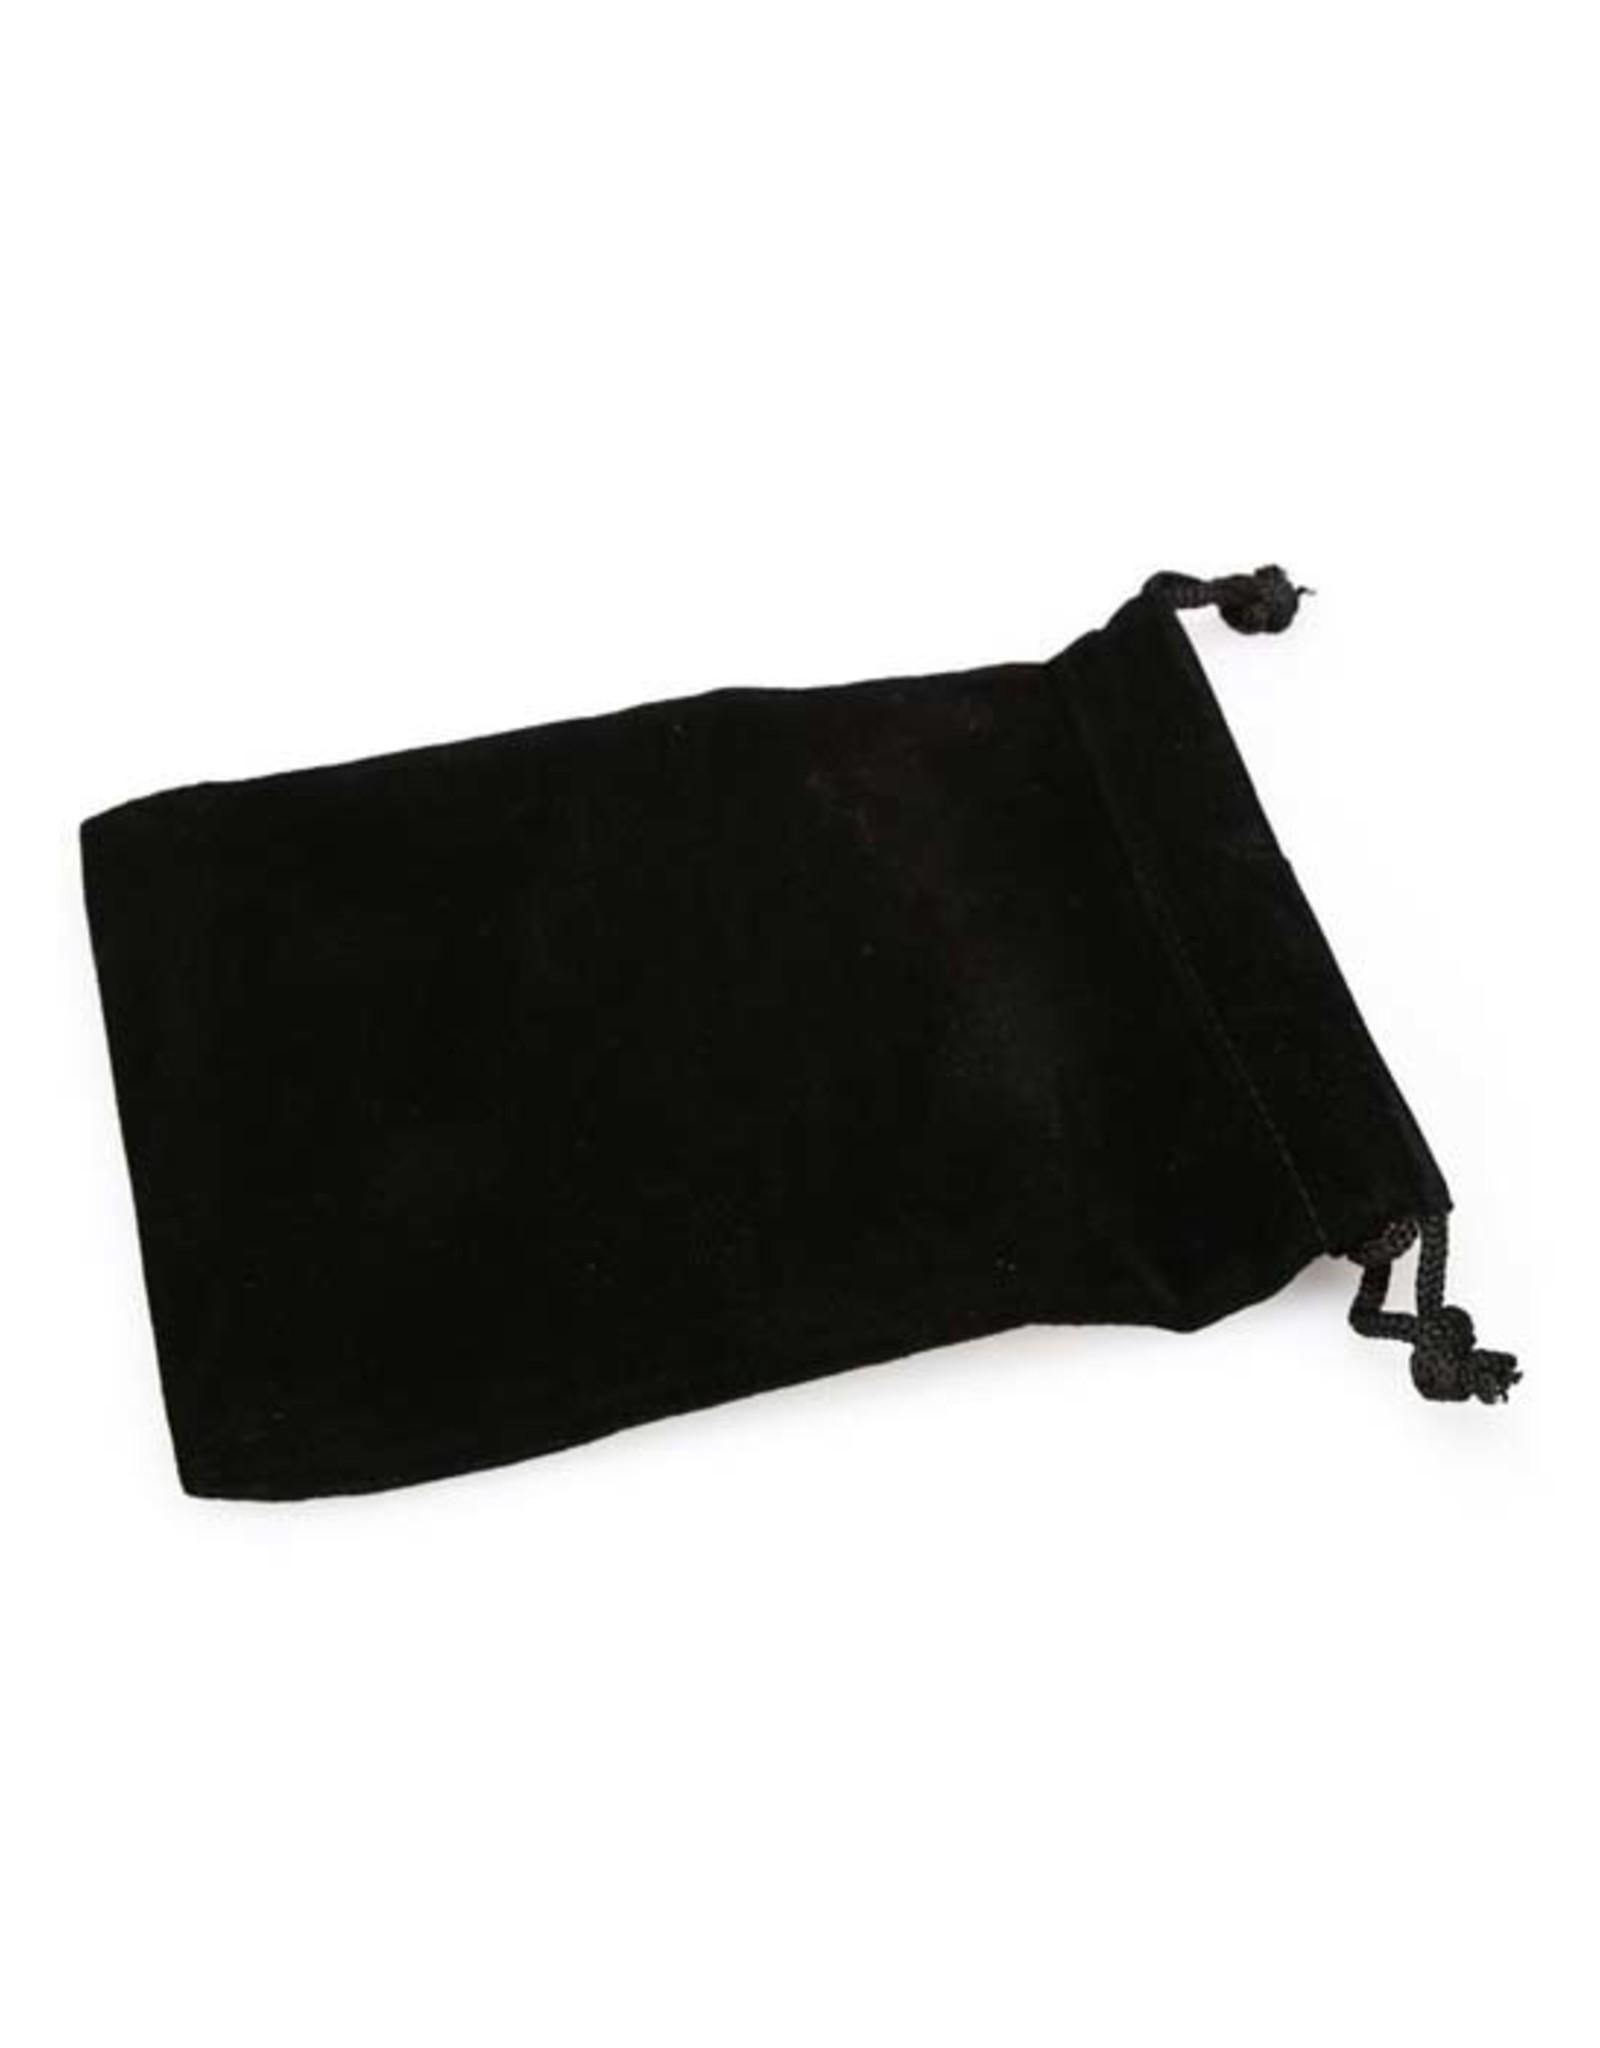 Chessex Chessex: Dice Bag - Small - Black